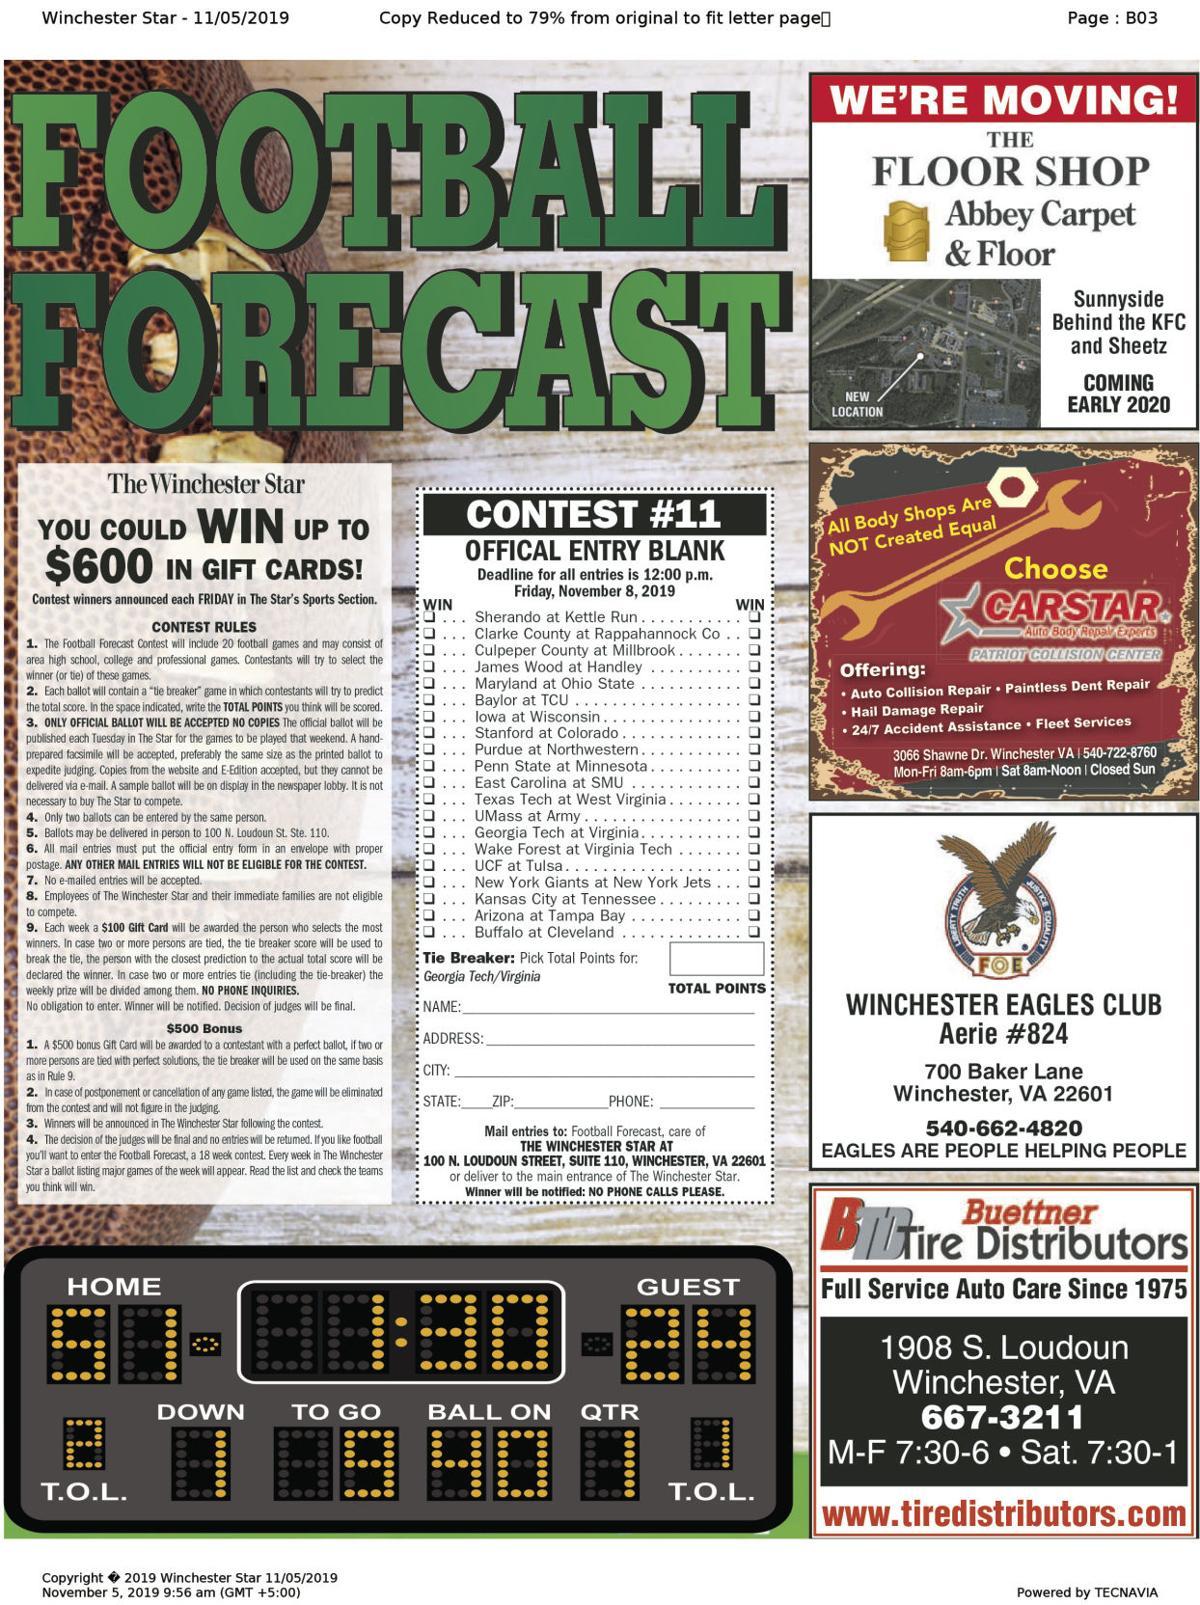 11-5 Football Forecast